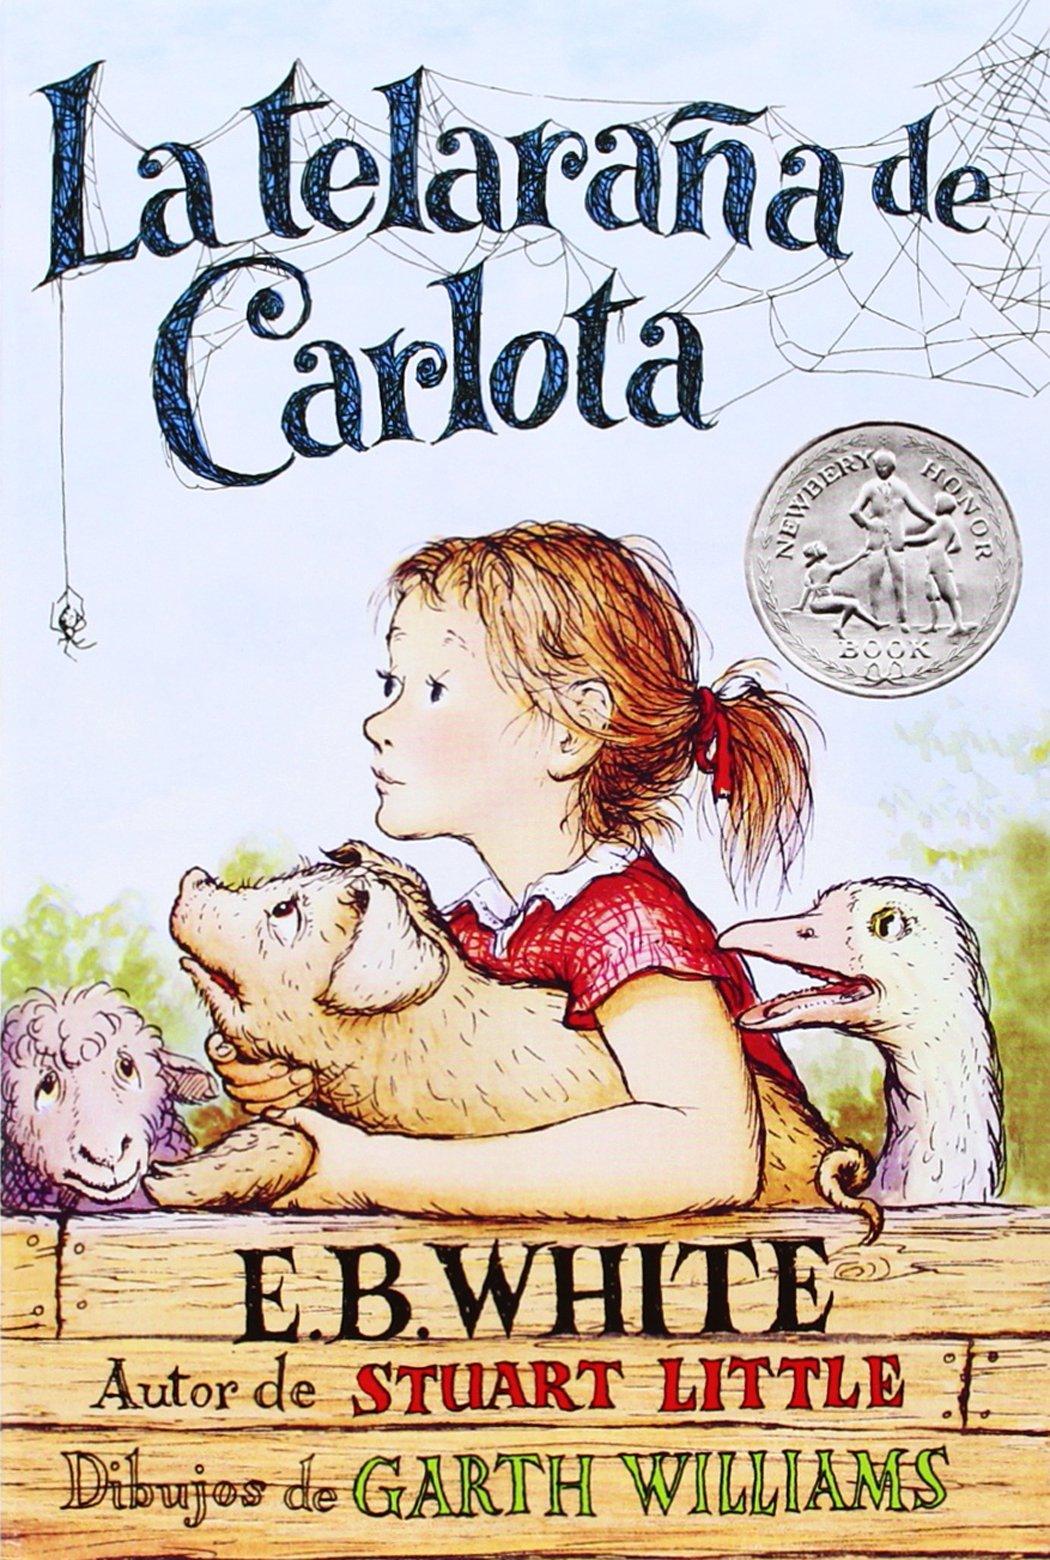 8. Carlota's web